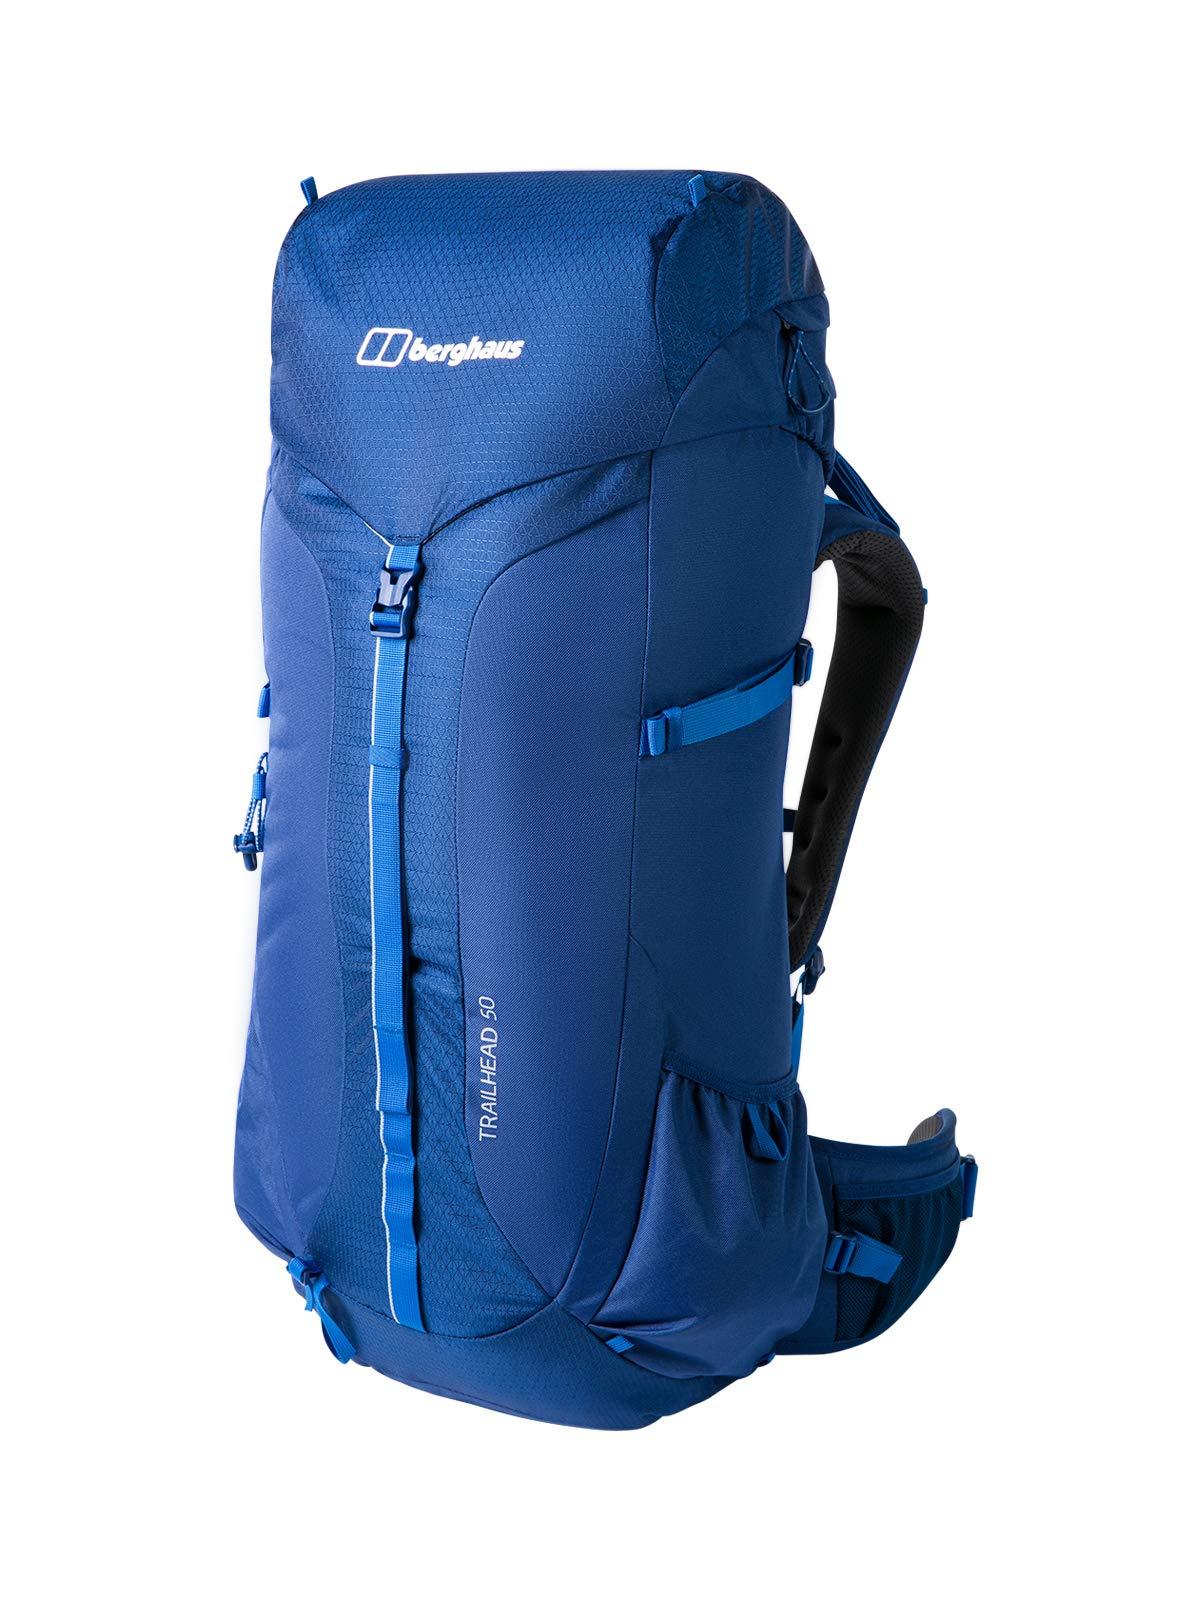 Berghaus Unisex-Erwachsene Trailhead 2.0 50 Litre Rucksack Blau (Deep Water)